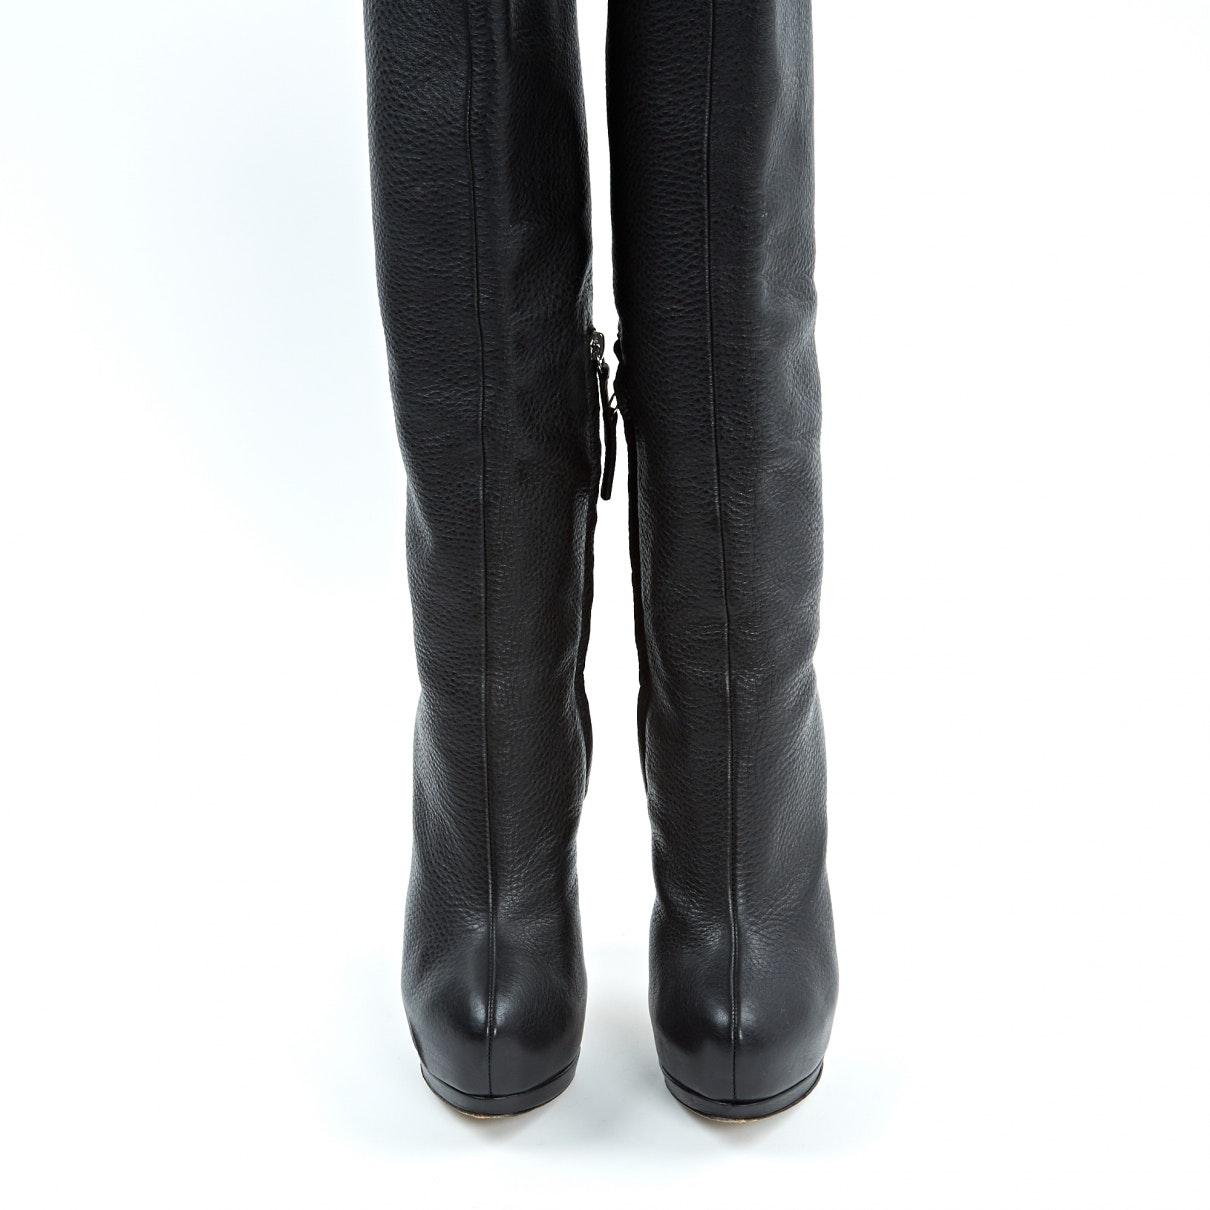 Botas de Cuero Giuseppe Zanotti de color Negro